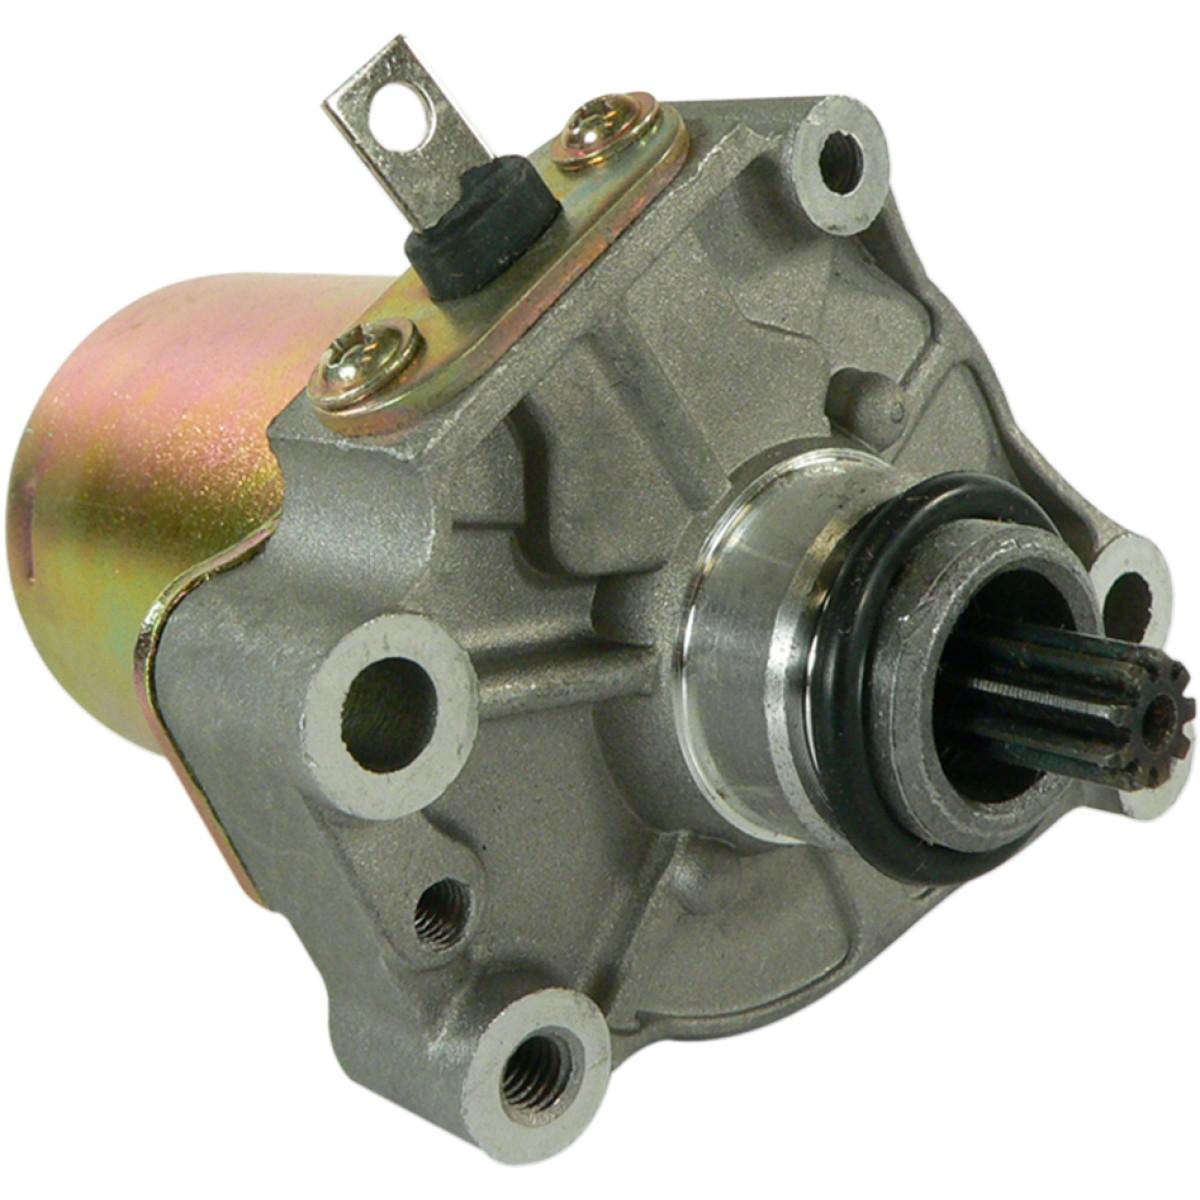 Starter motor Aprilia RS Classic Tuono 125 1995-2013 AP0294802